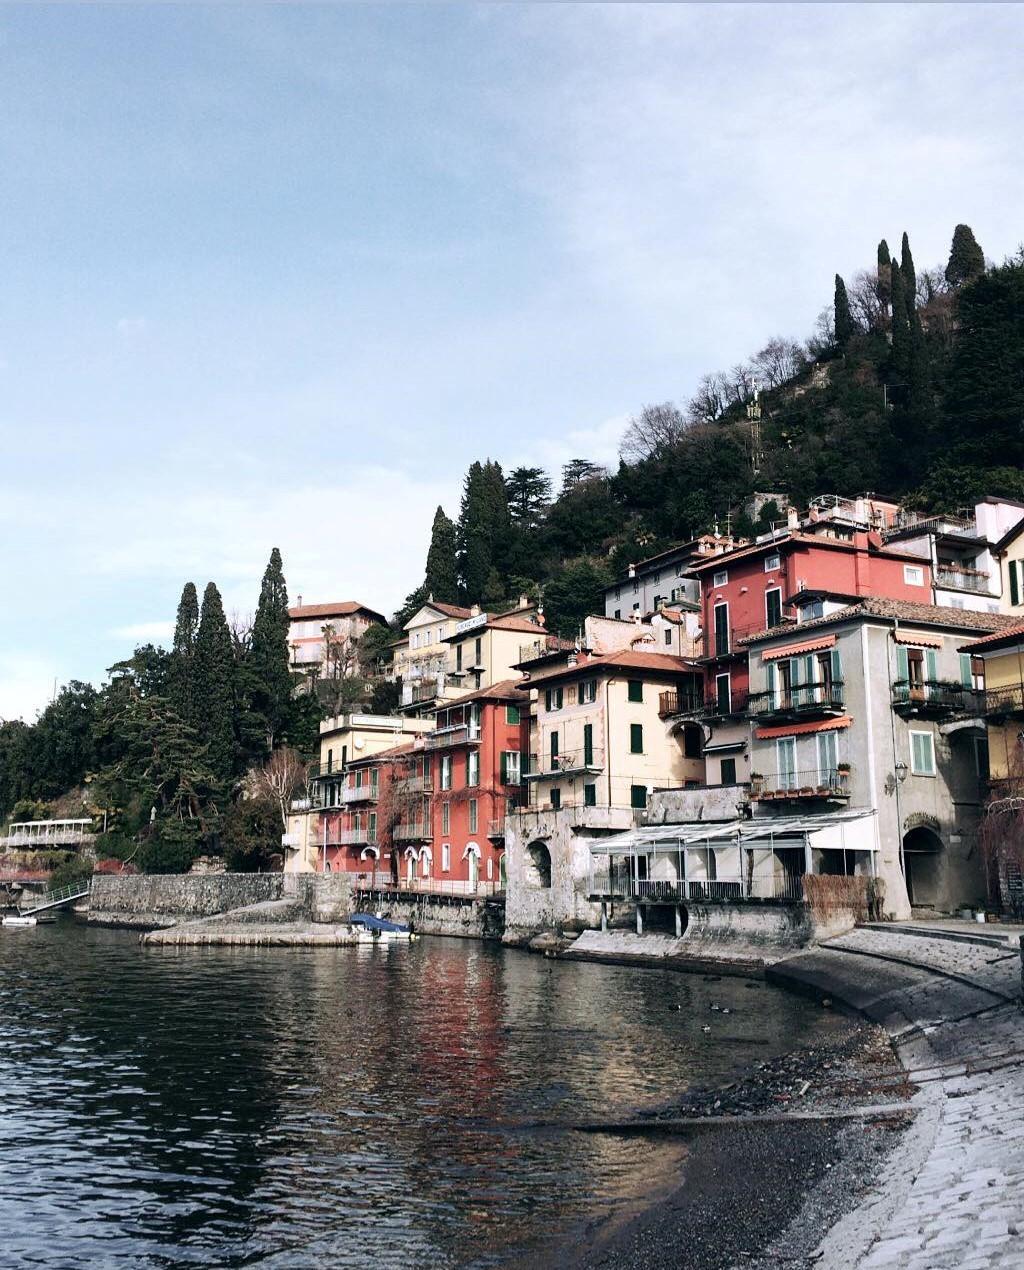 day-trip-varenna-bellagio-3fa08fac5461de